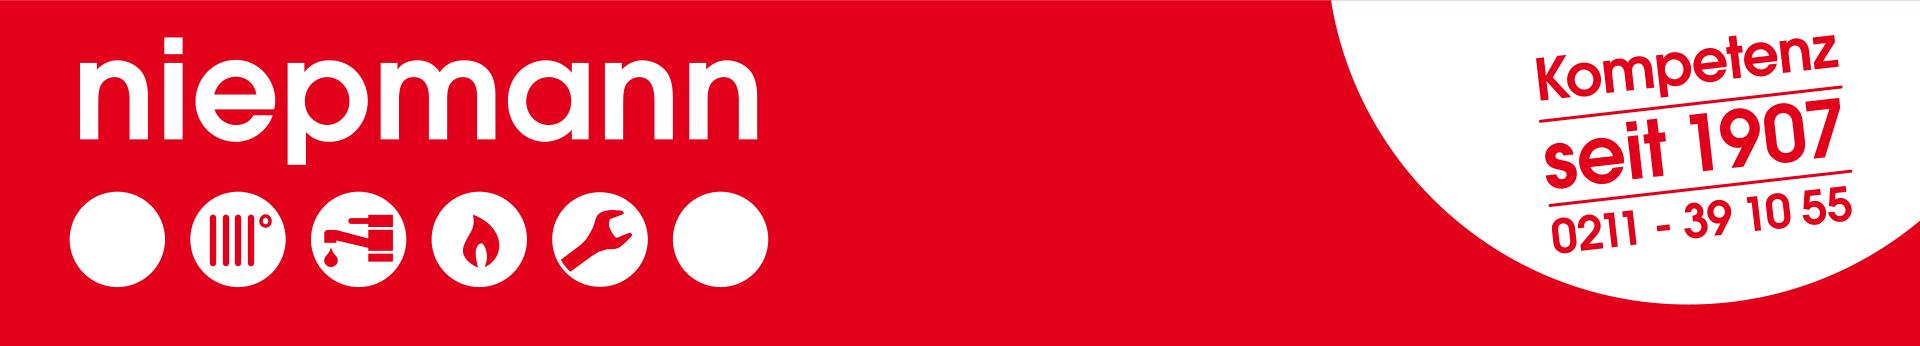 Logo der Firma Niepmann SHK. Kompetenz seit 1907 - 0211 391055